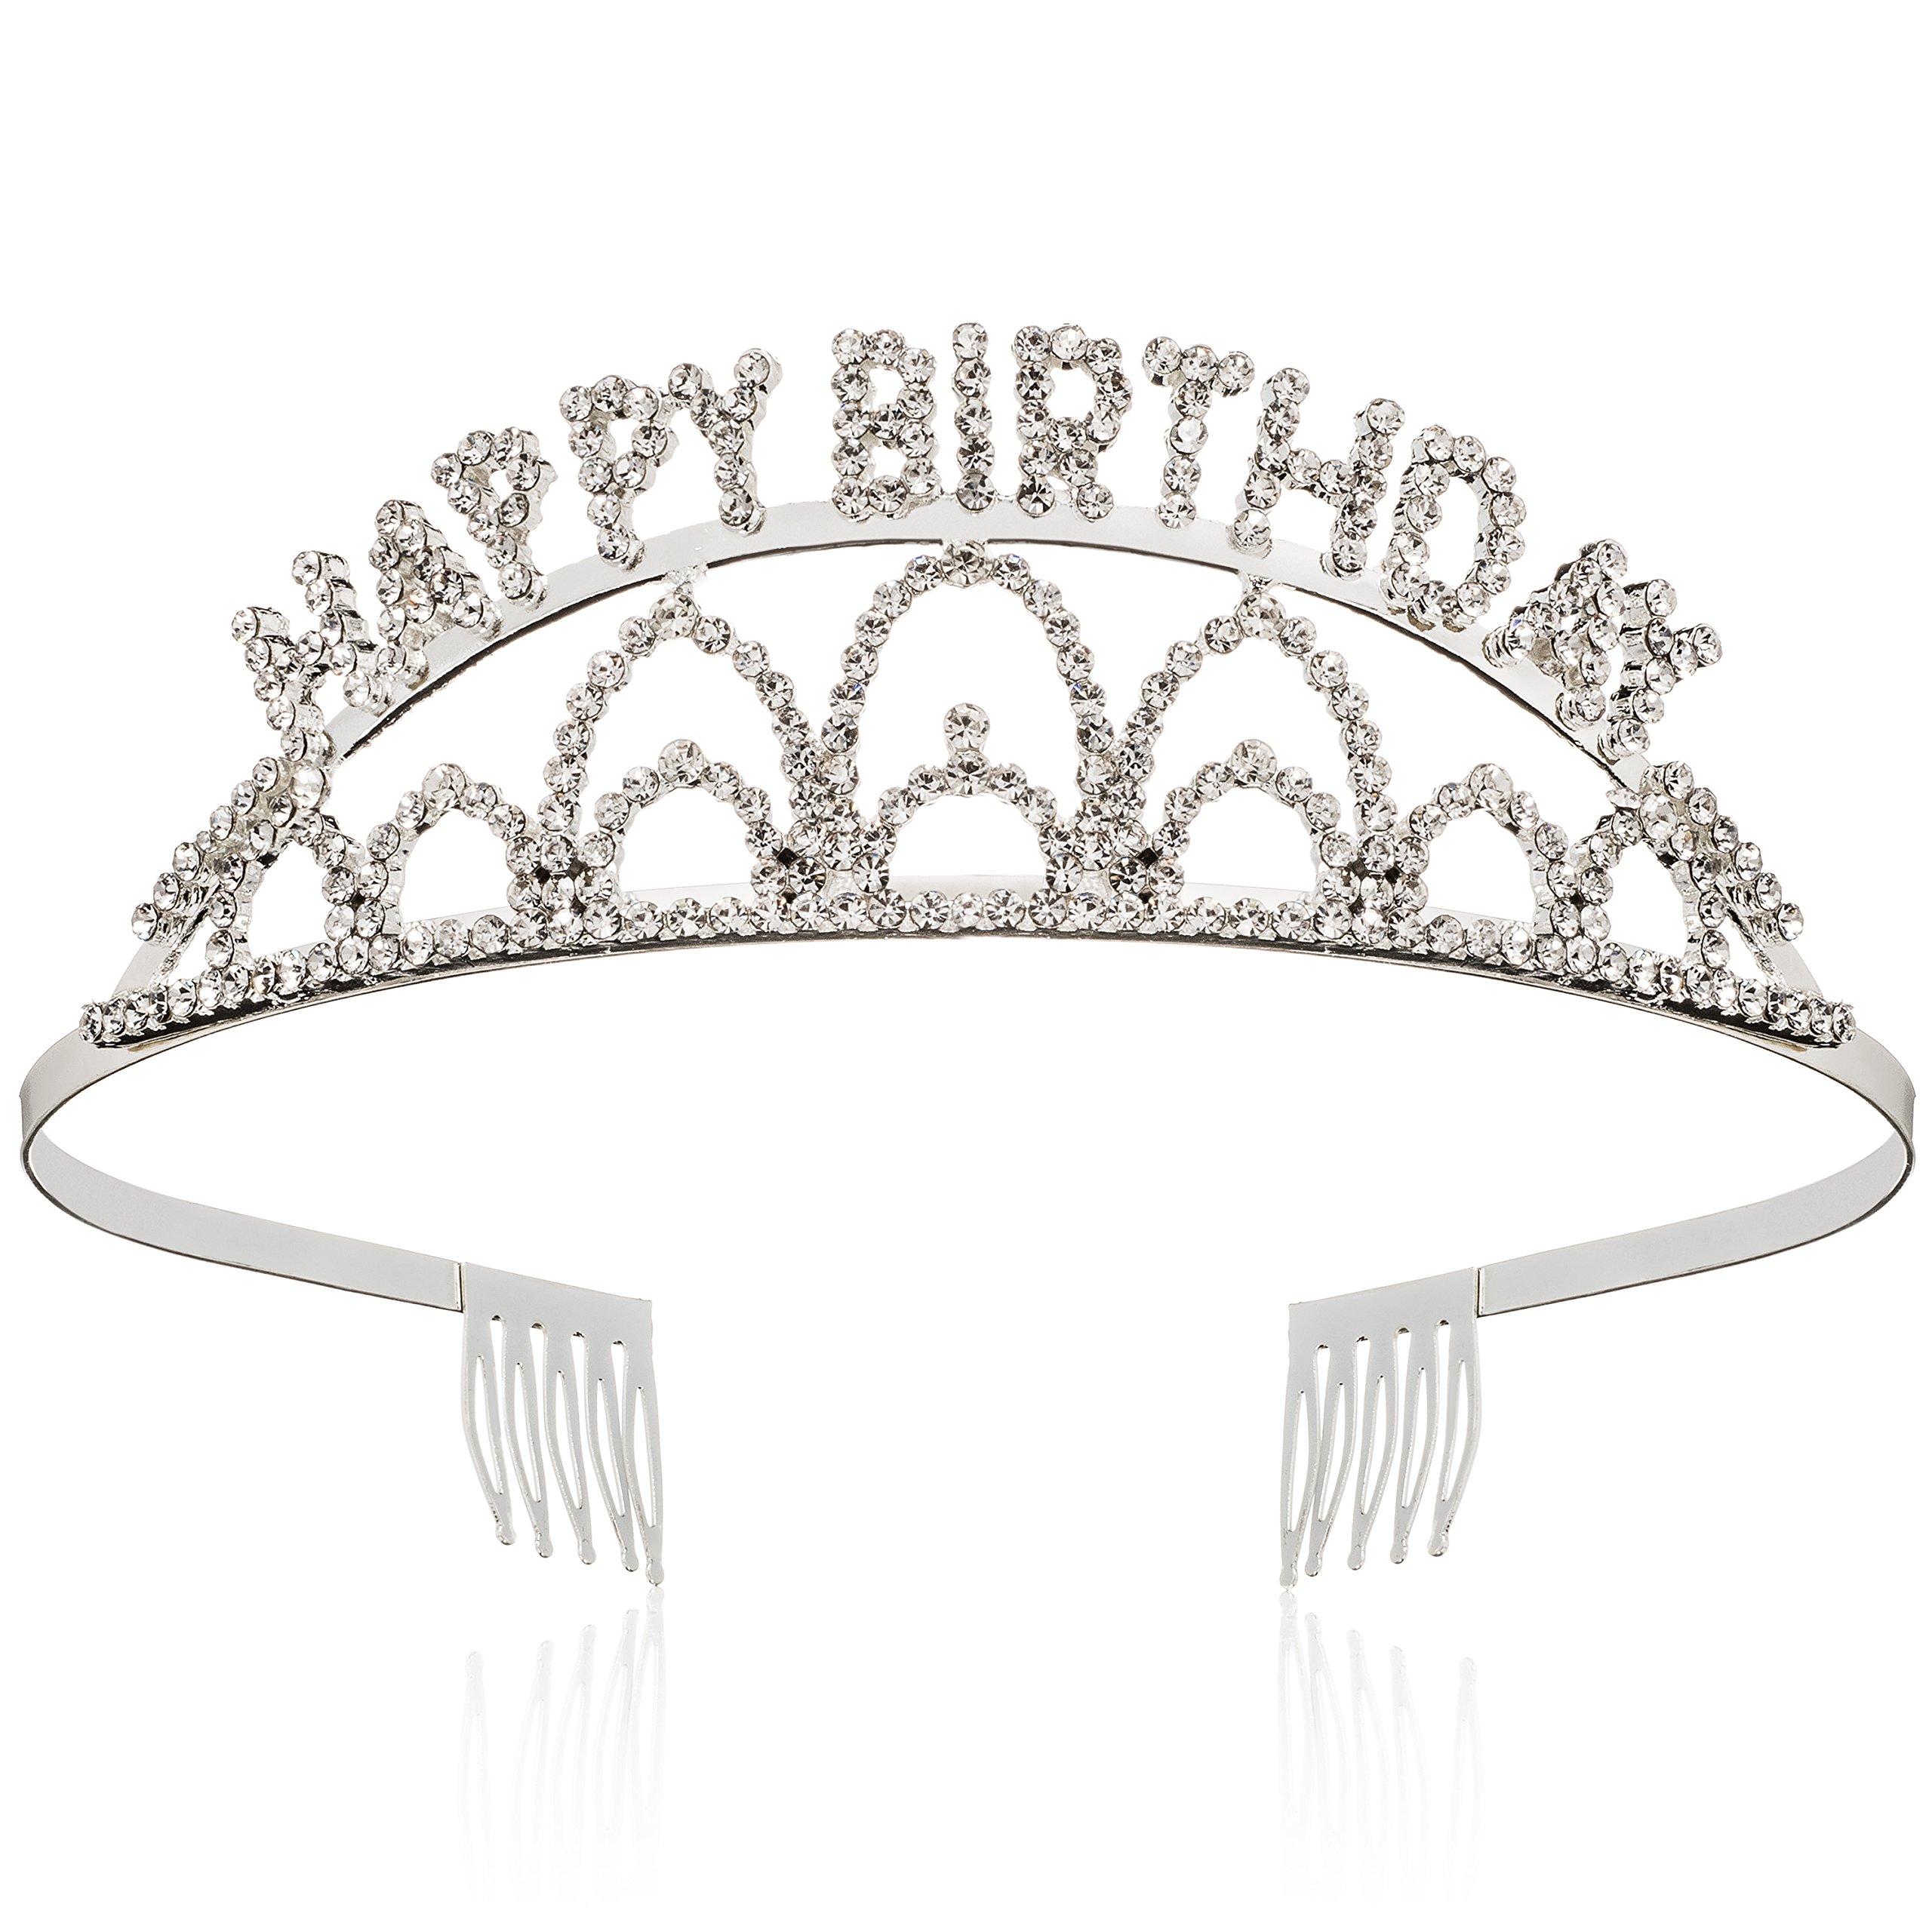 Elegant Rhinestone Happy Birthday Tiara - Premium Quality Metal Birthday Party Tiara